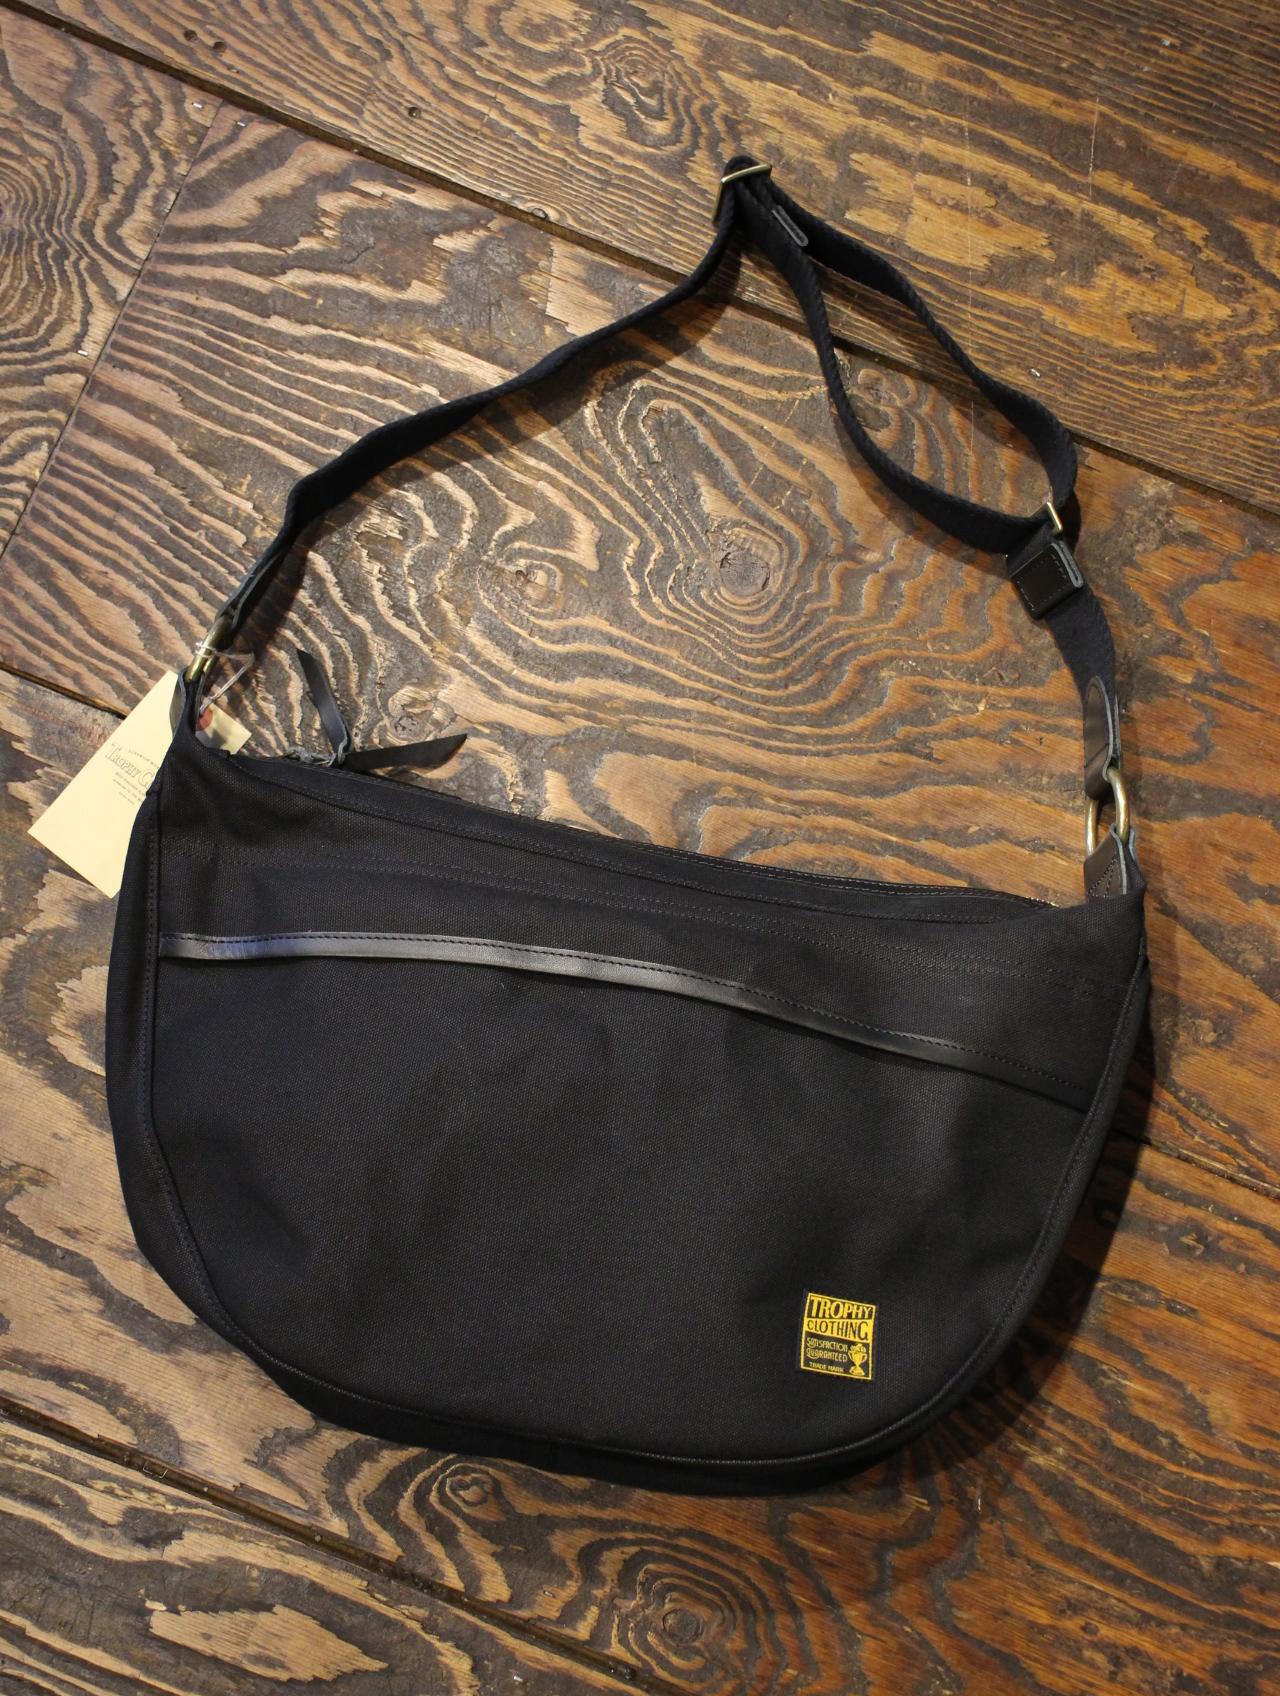 TROPHY CLOTHING  「Road Trip Bag」  ショルダーバッグ